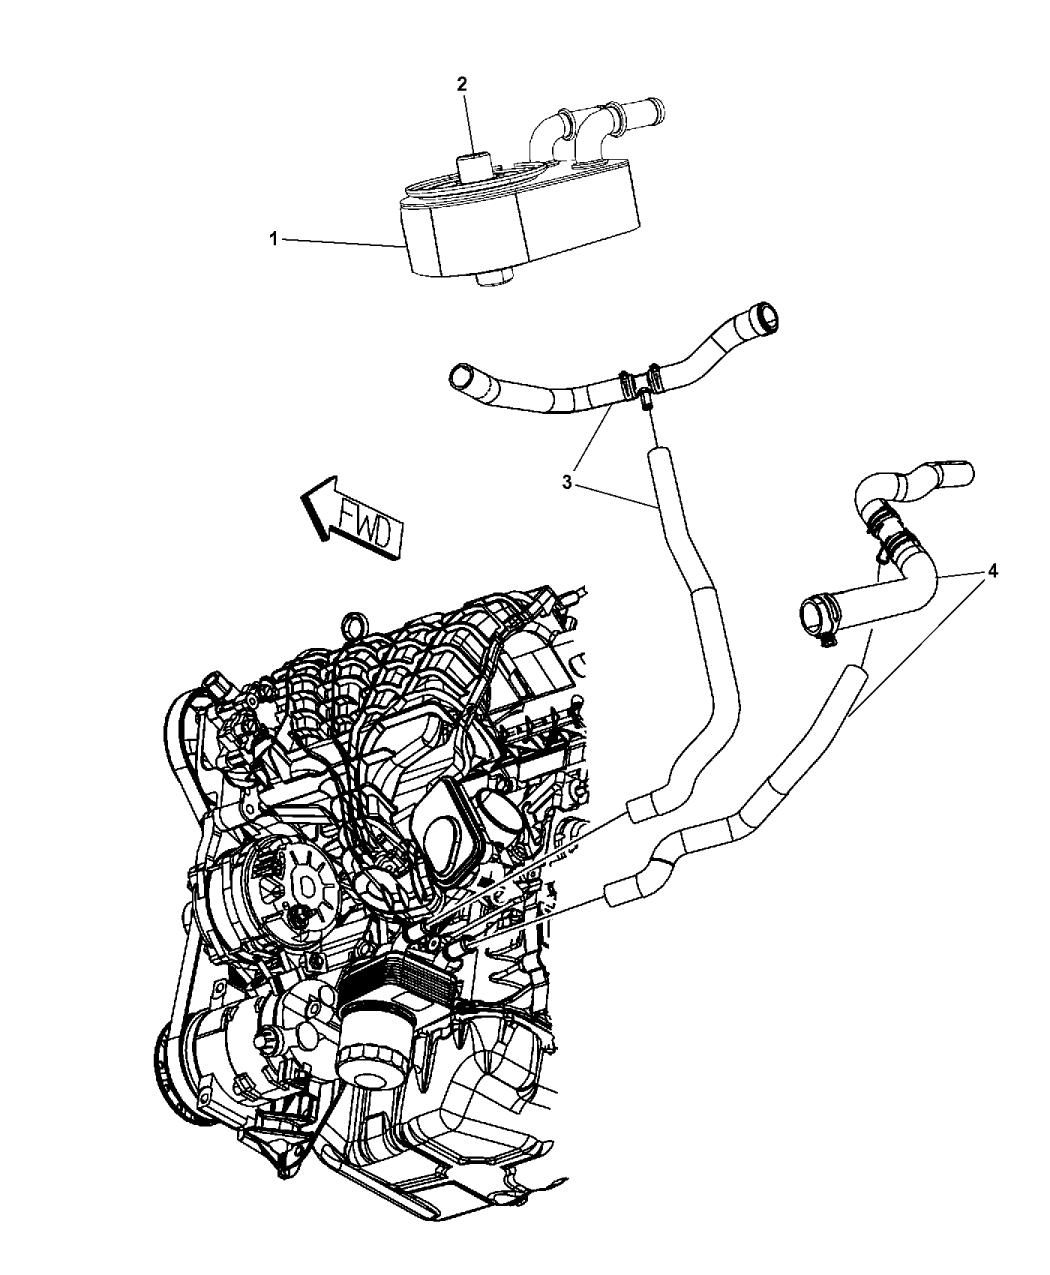 2010 jeep patriot engine oil cooler & hoses/tubes - thumbnail 1